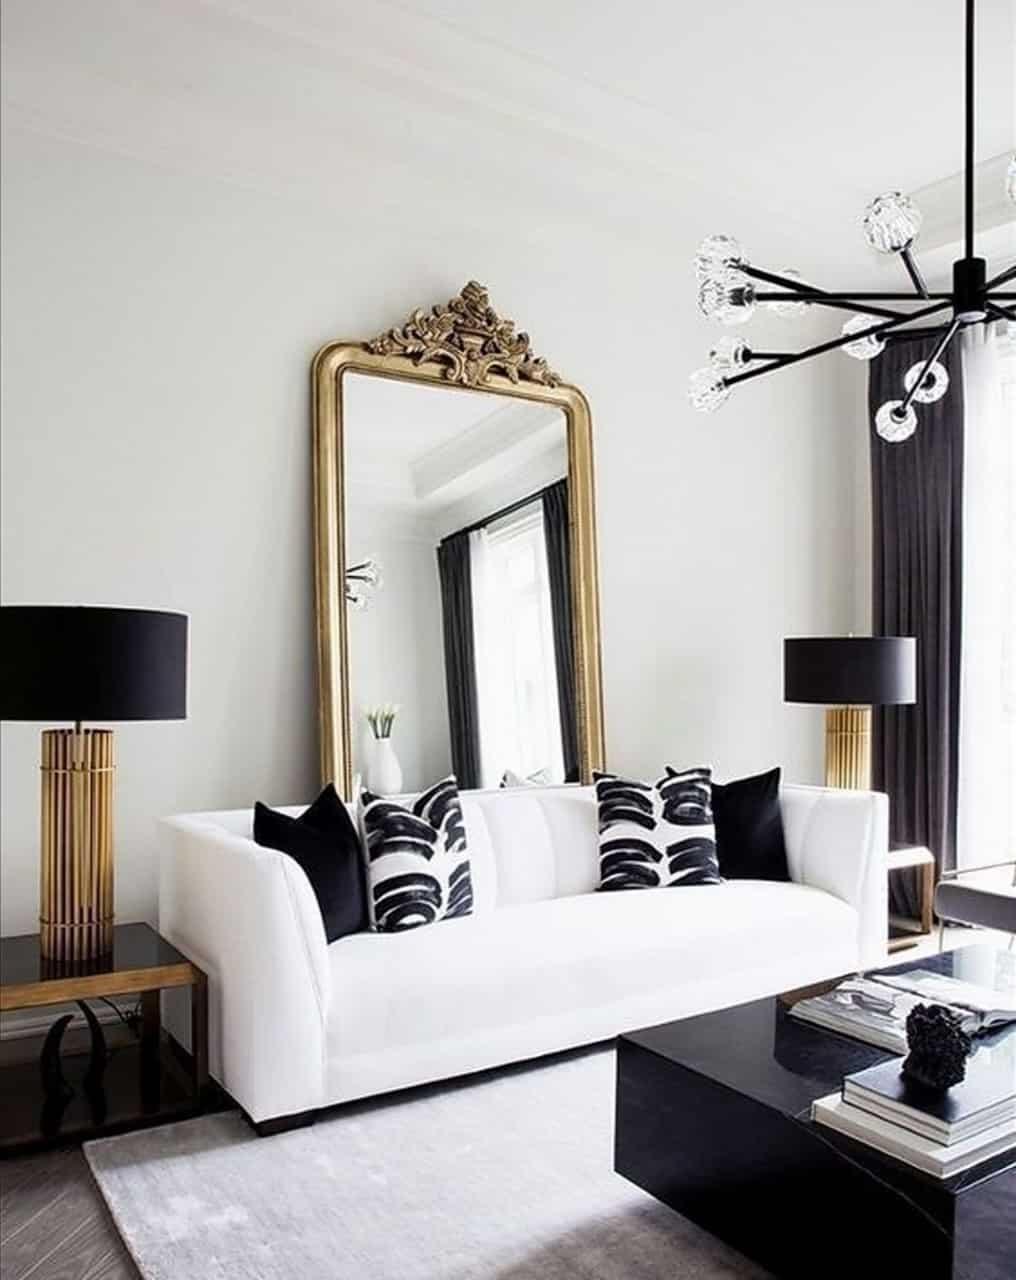 mykonos services - interior design mykonos - anakainiseis - renovations 100